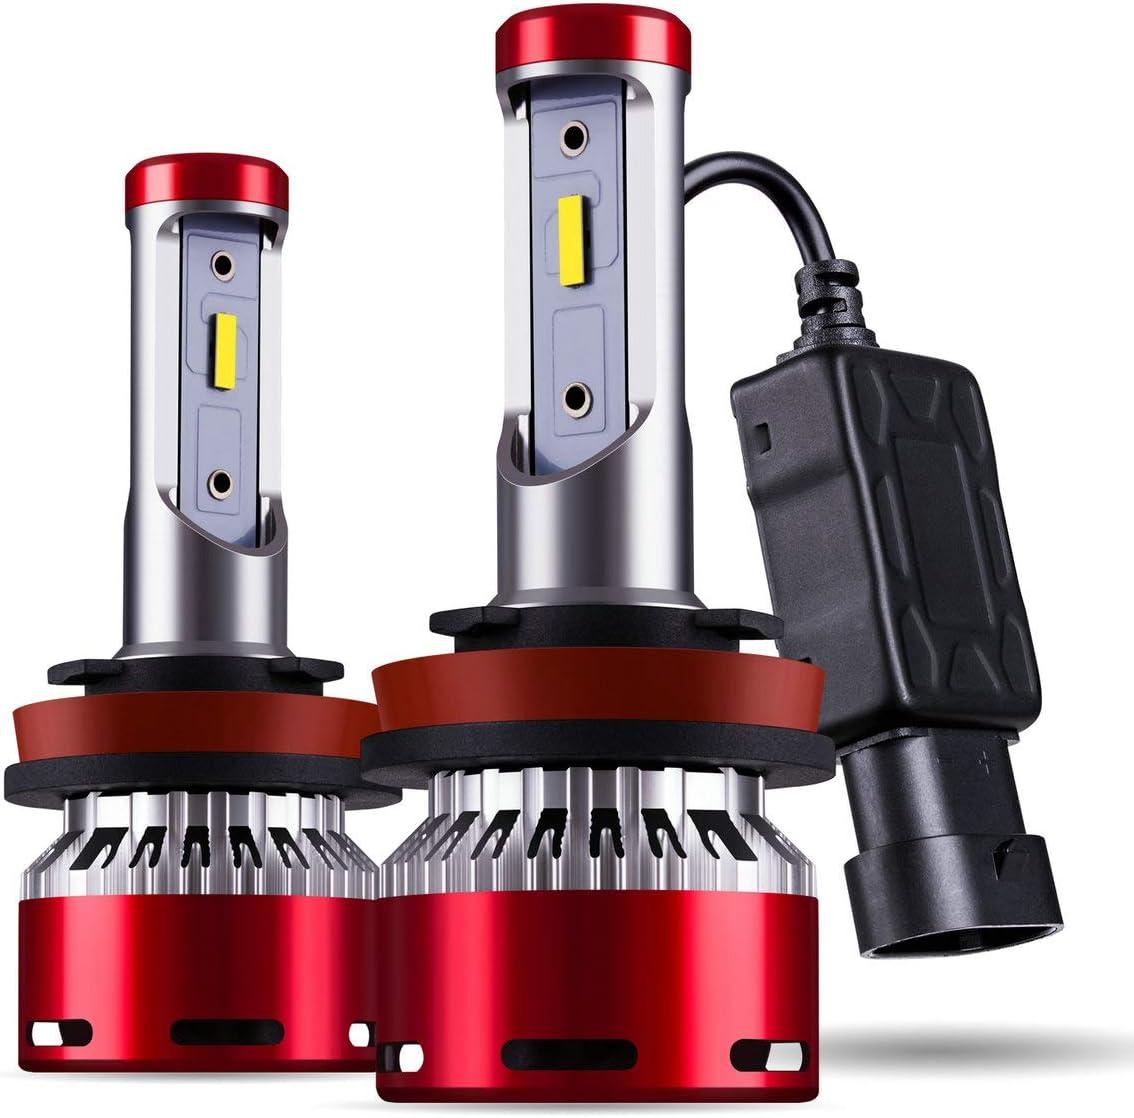 DODOFUN H8 H9 H11 Car LED Headlight Bulb Conversion Kit - High Beam Low Beam and Fog Light Replacement 6000K Xenon White Ultra High Performance Bright Non-polarity